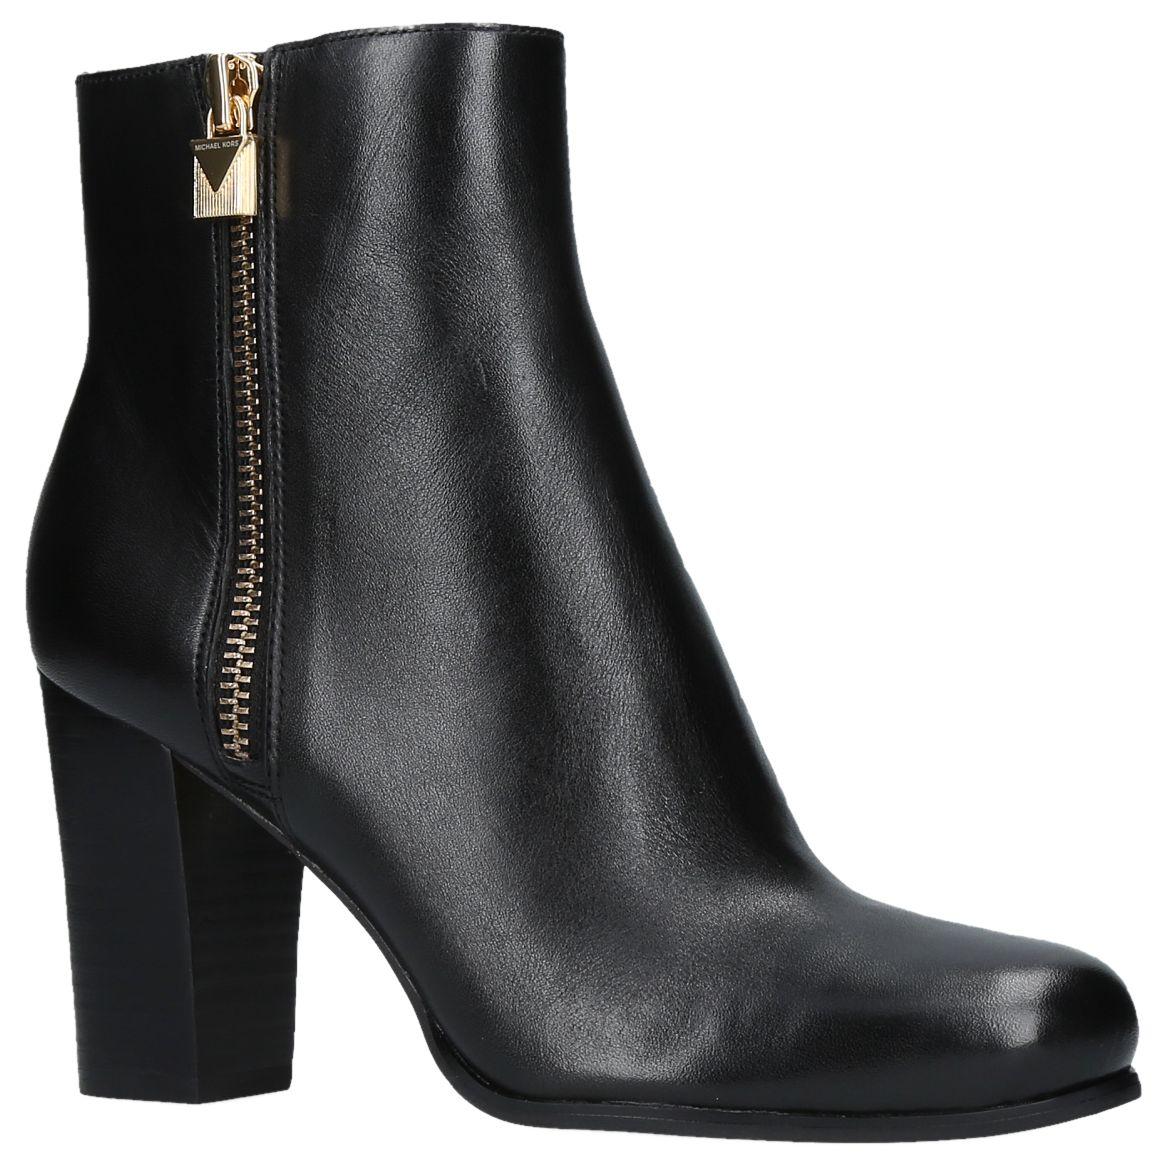 2e7544749ee7 MICHAEL Michael Kors Margaret Block Heel Ankle Boots at John Lewis    Partners